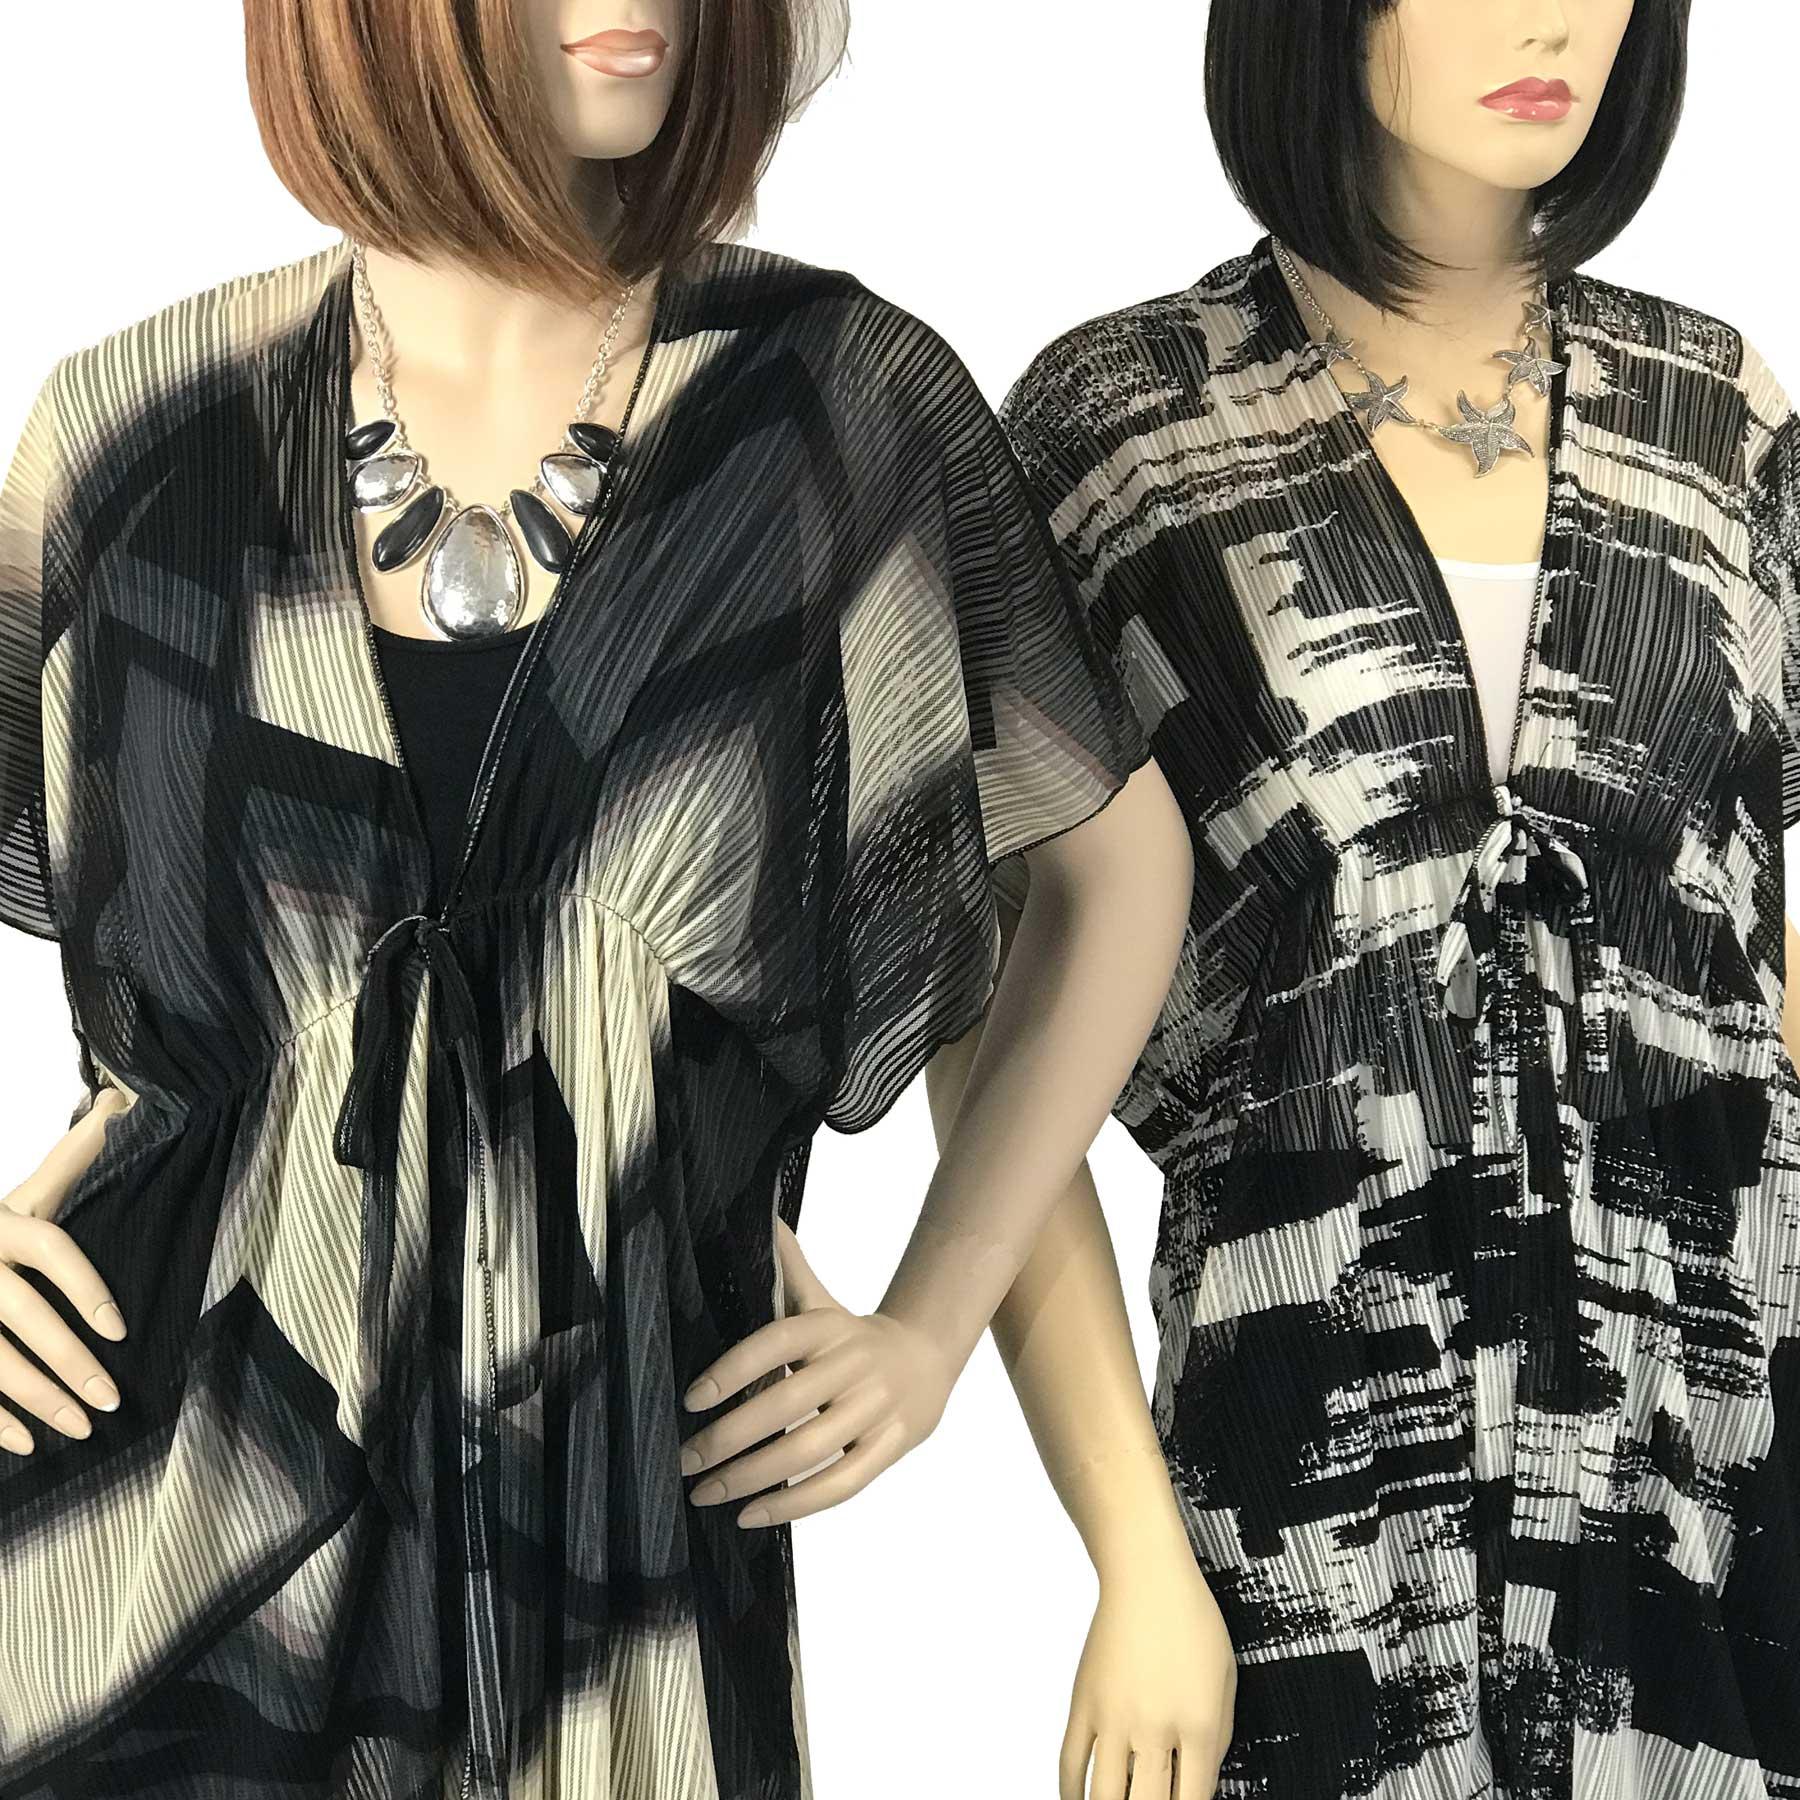 Kimono - Multi Texture Mesh w/ Belt 1314 & 1315